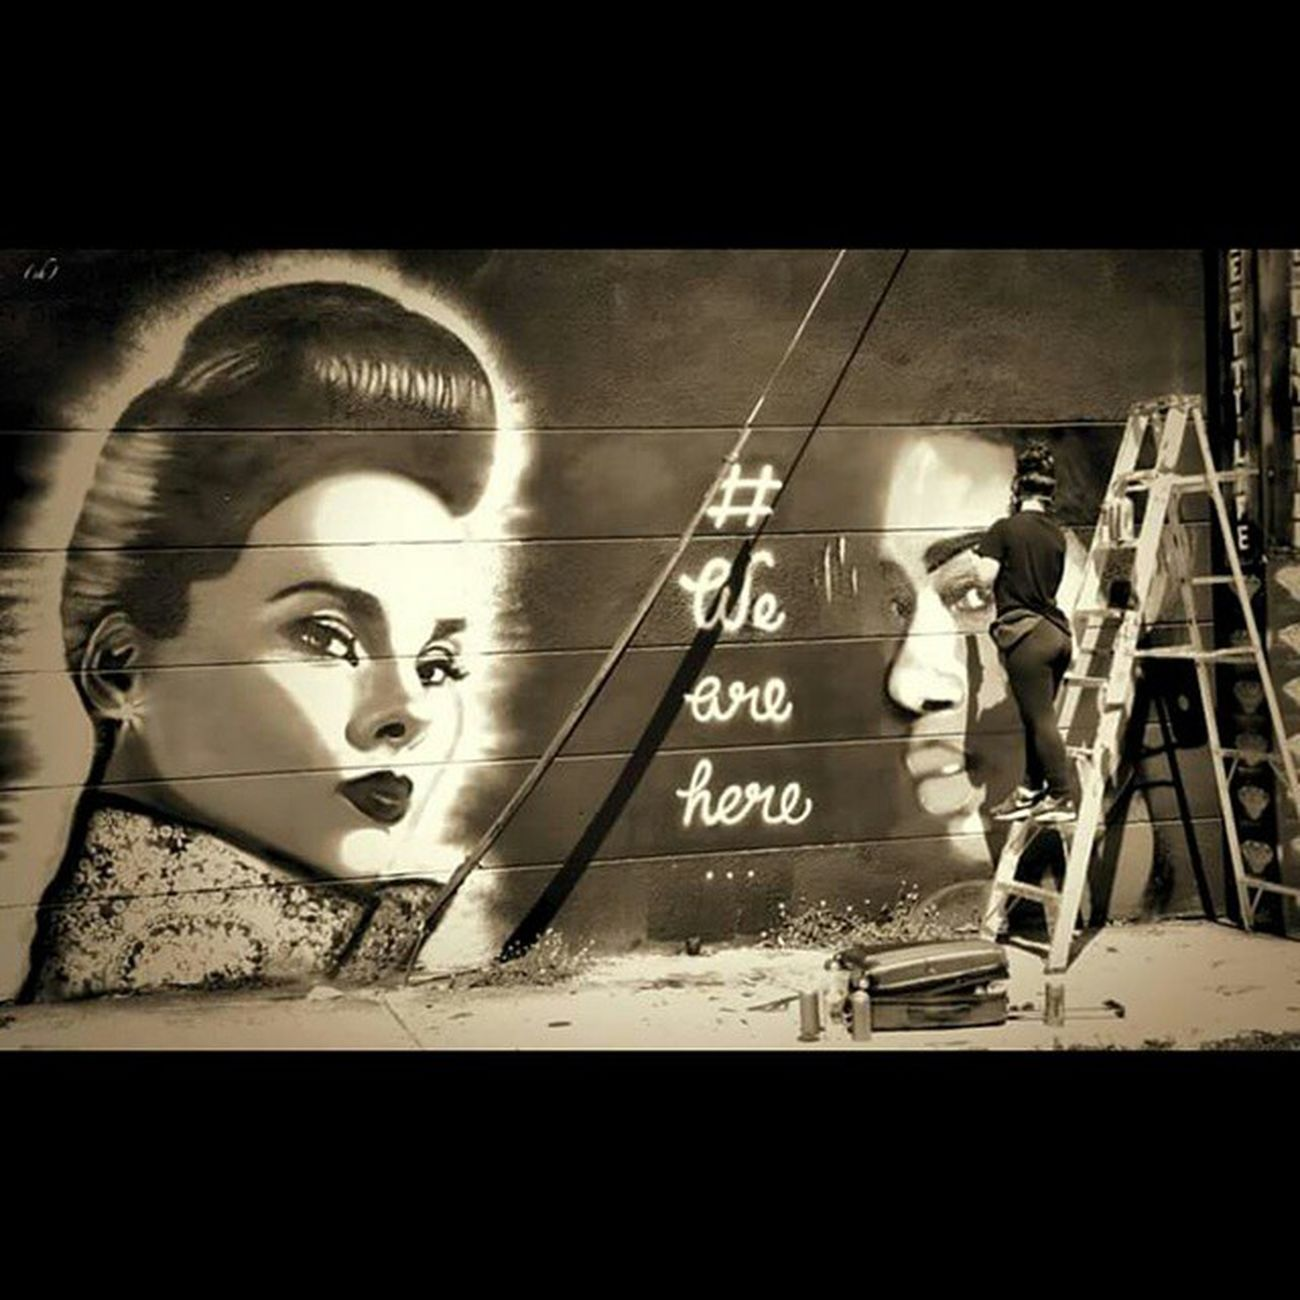 Wah Wearehere Women Aliciakeys @aliciakeys Spraypaint Wynwood Streetart Sepia Miami Follow me